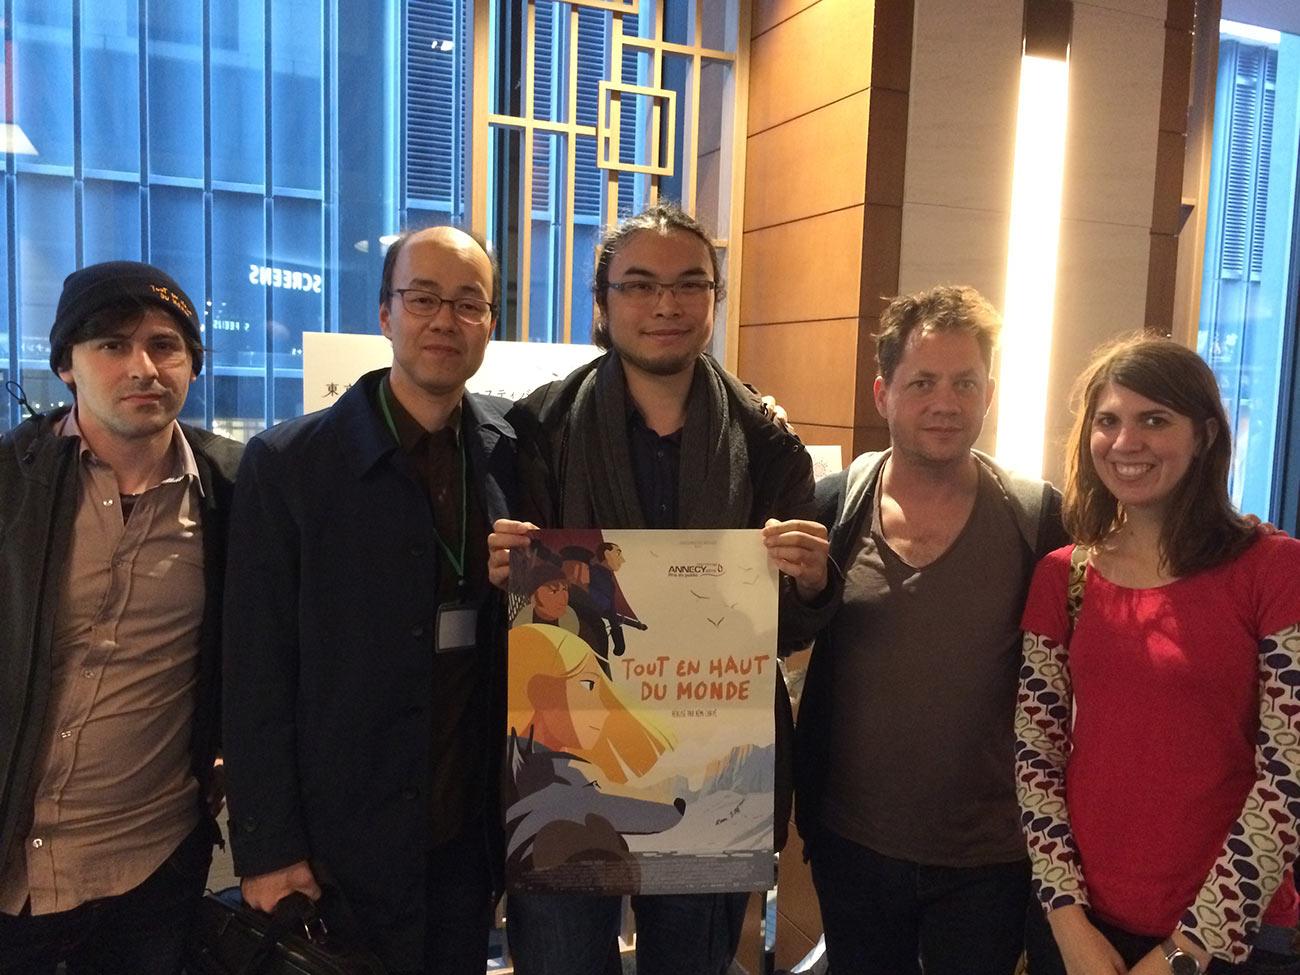 "Left to right: Alexander Petreski (layout posing artist), Toshiyuki Inoue (festival jury member), Liane-Cho Han, Ron Dyens (co-producer, Sacrebleu Productions), Marick Queven (assistant"" animator)."